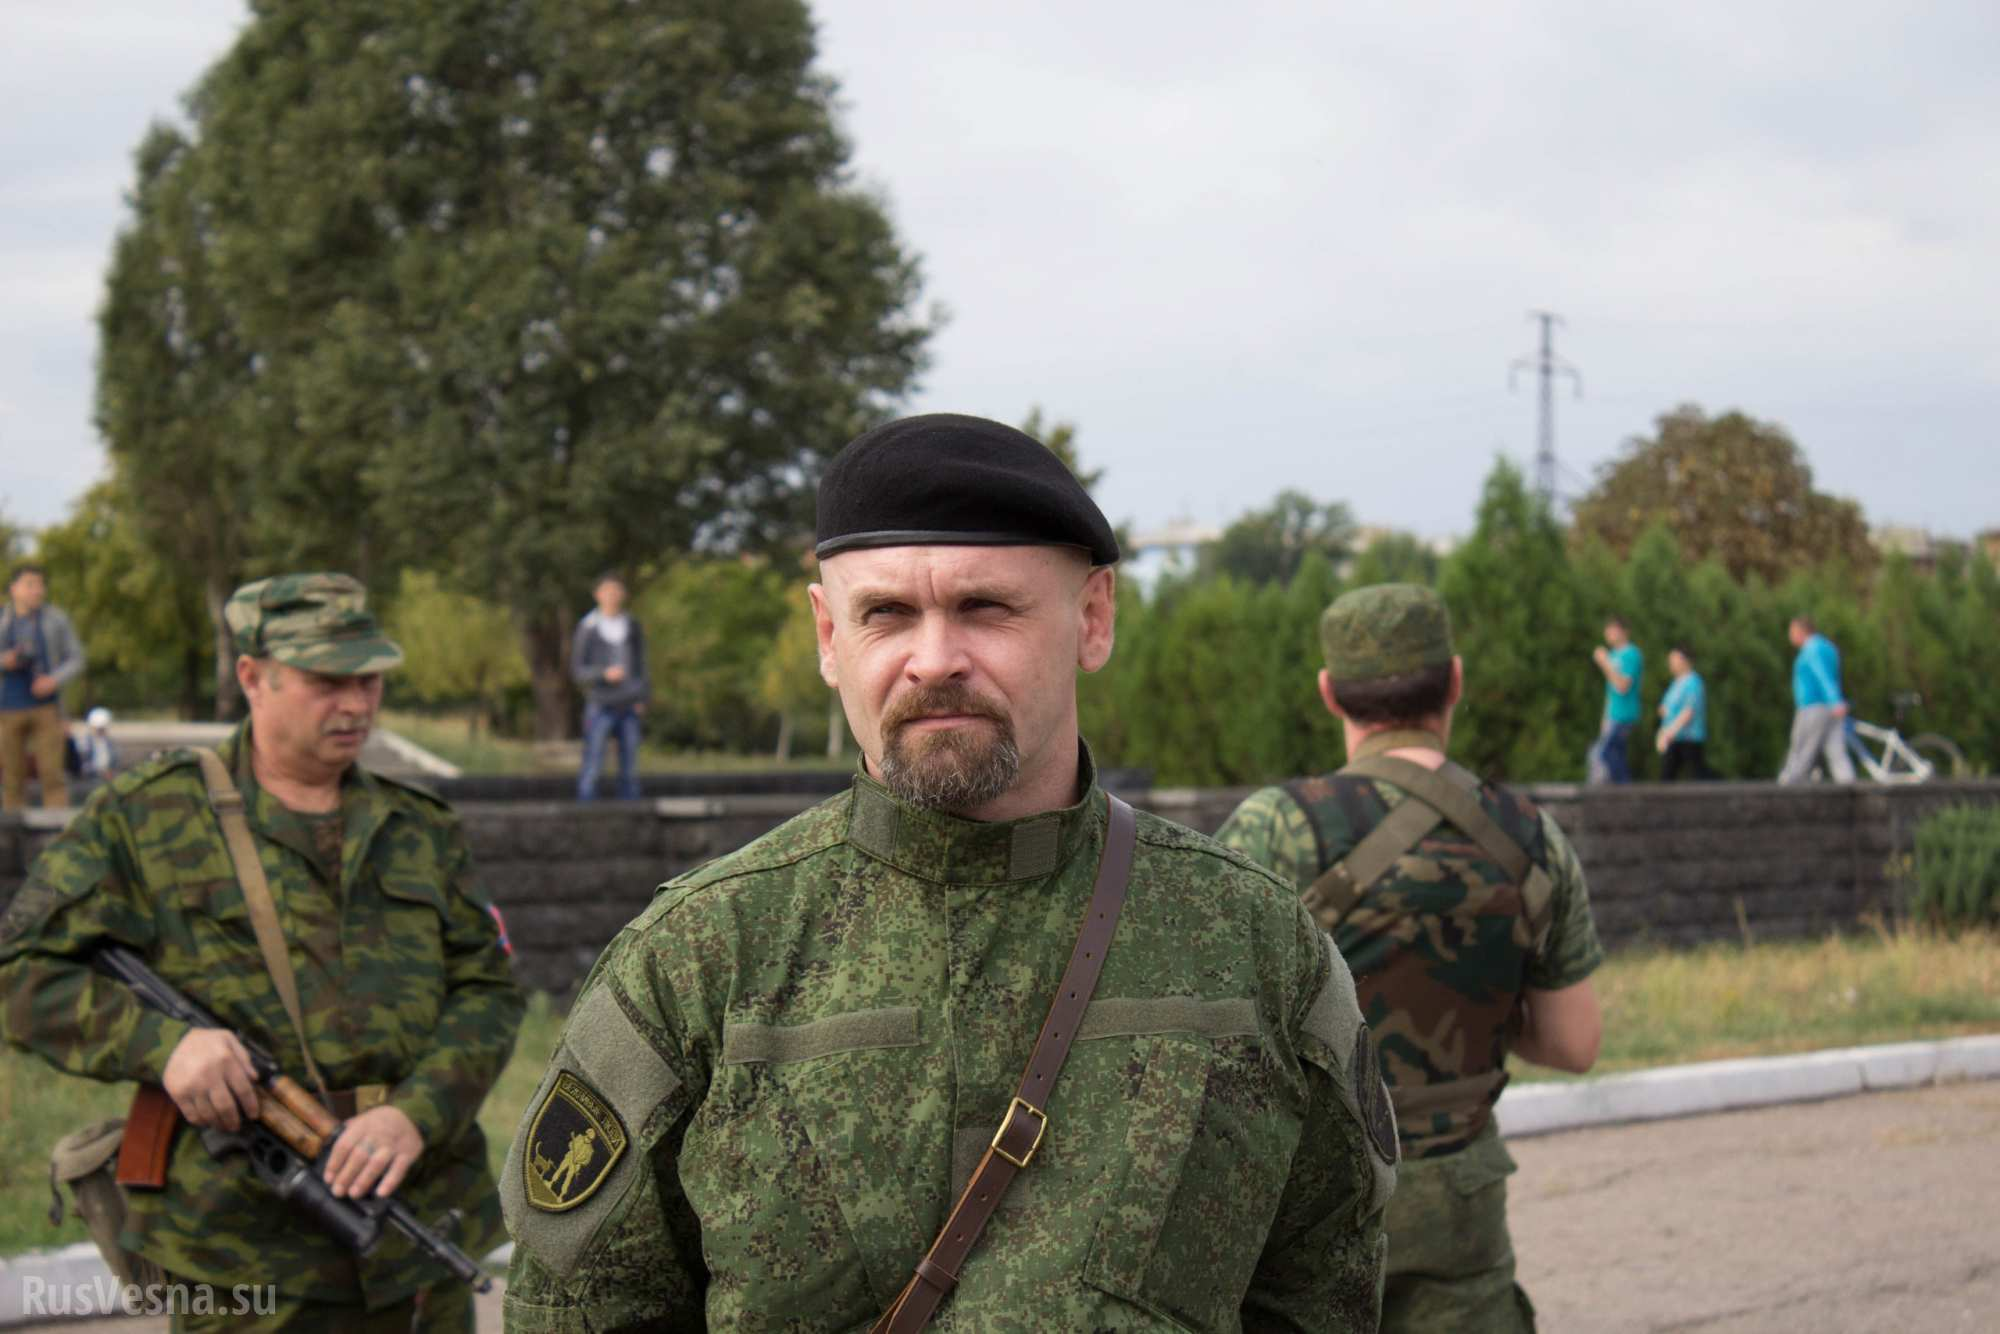 mozgovoy_aleksey_prizrak_brigada